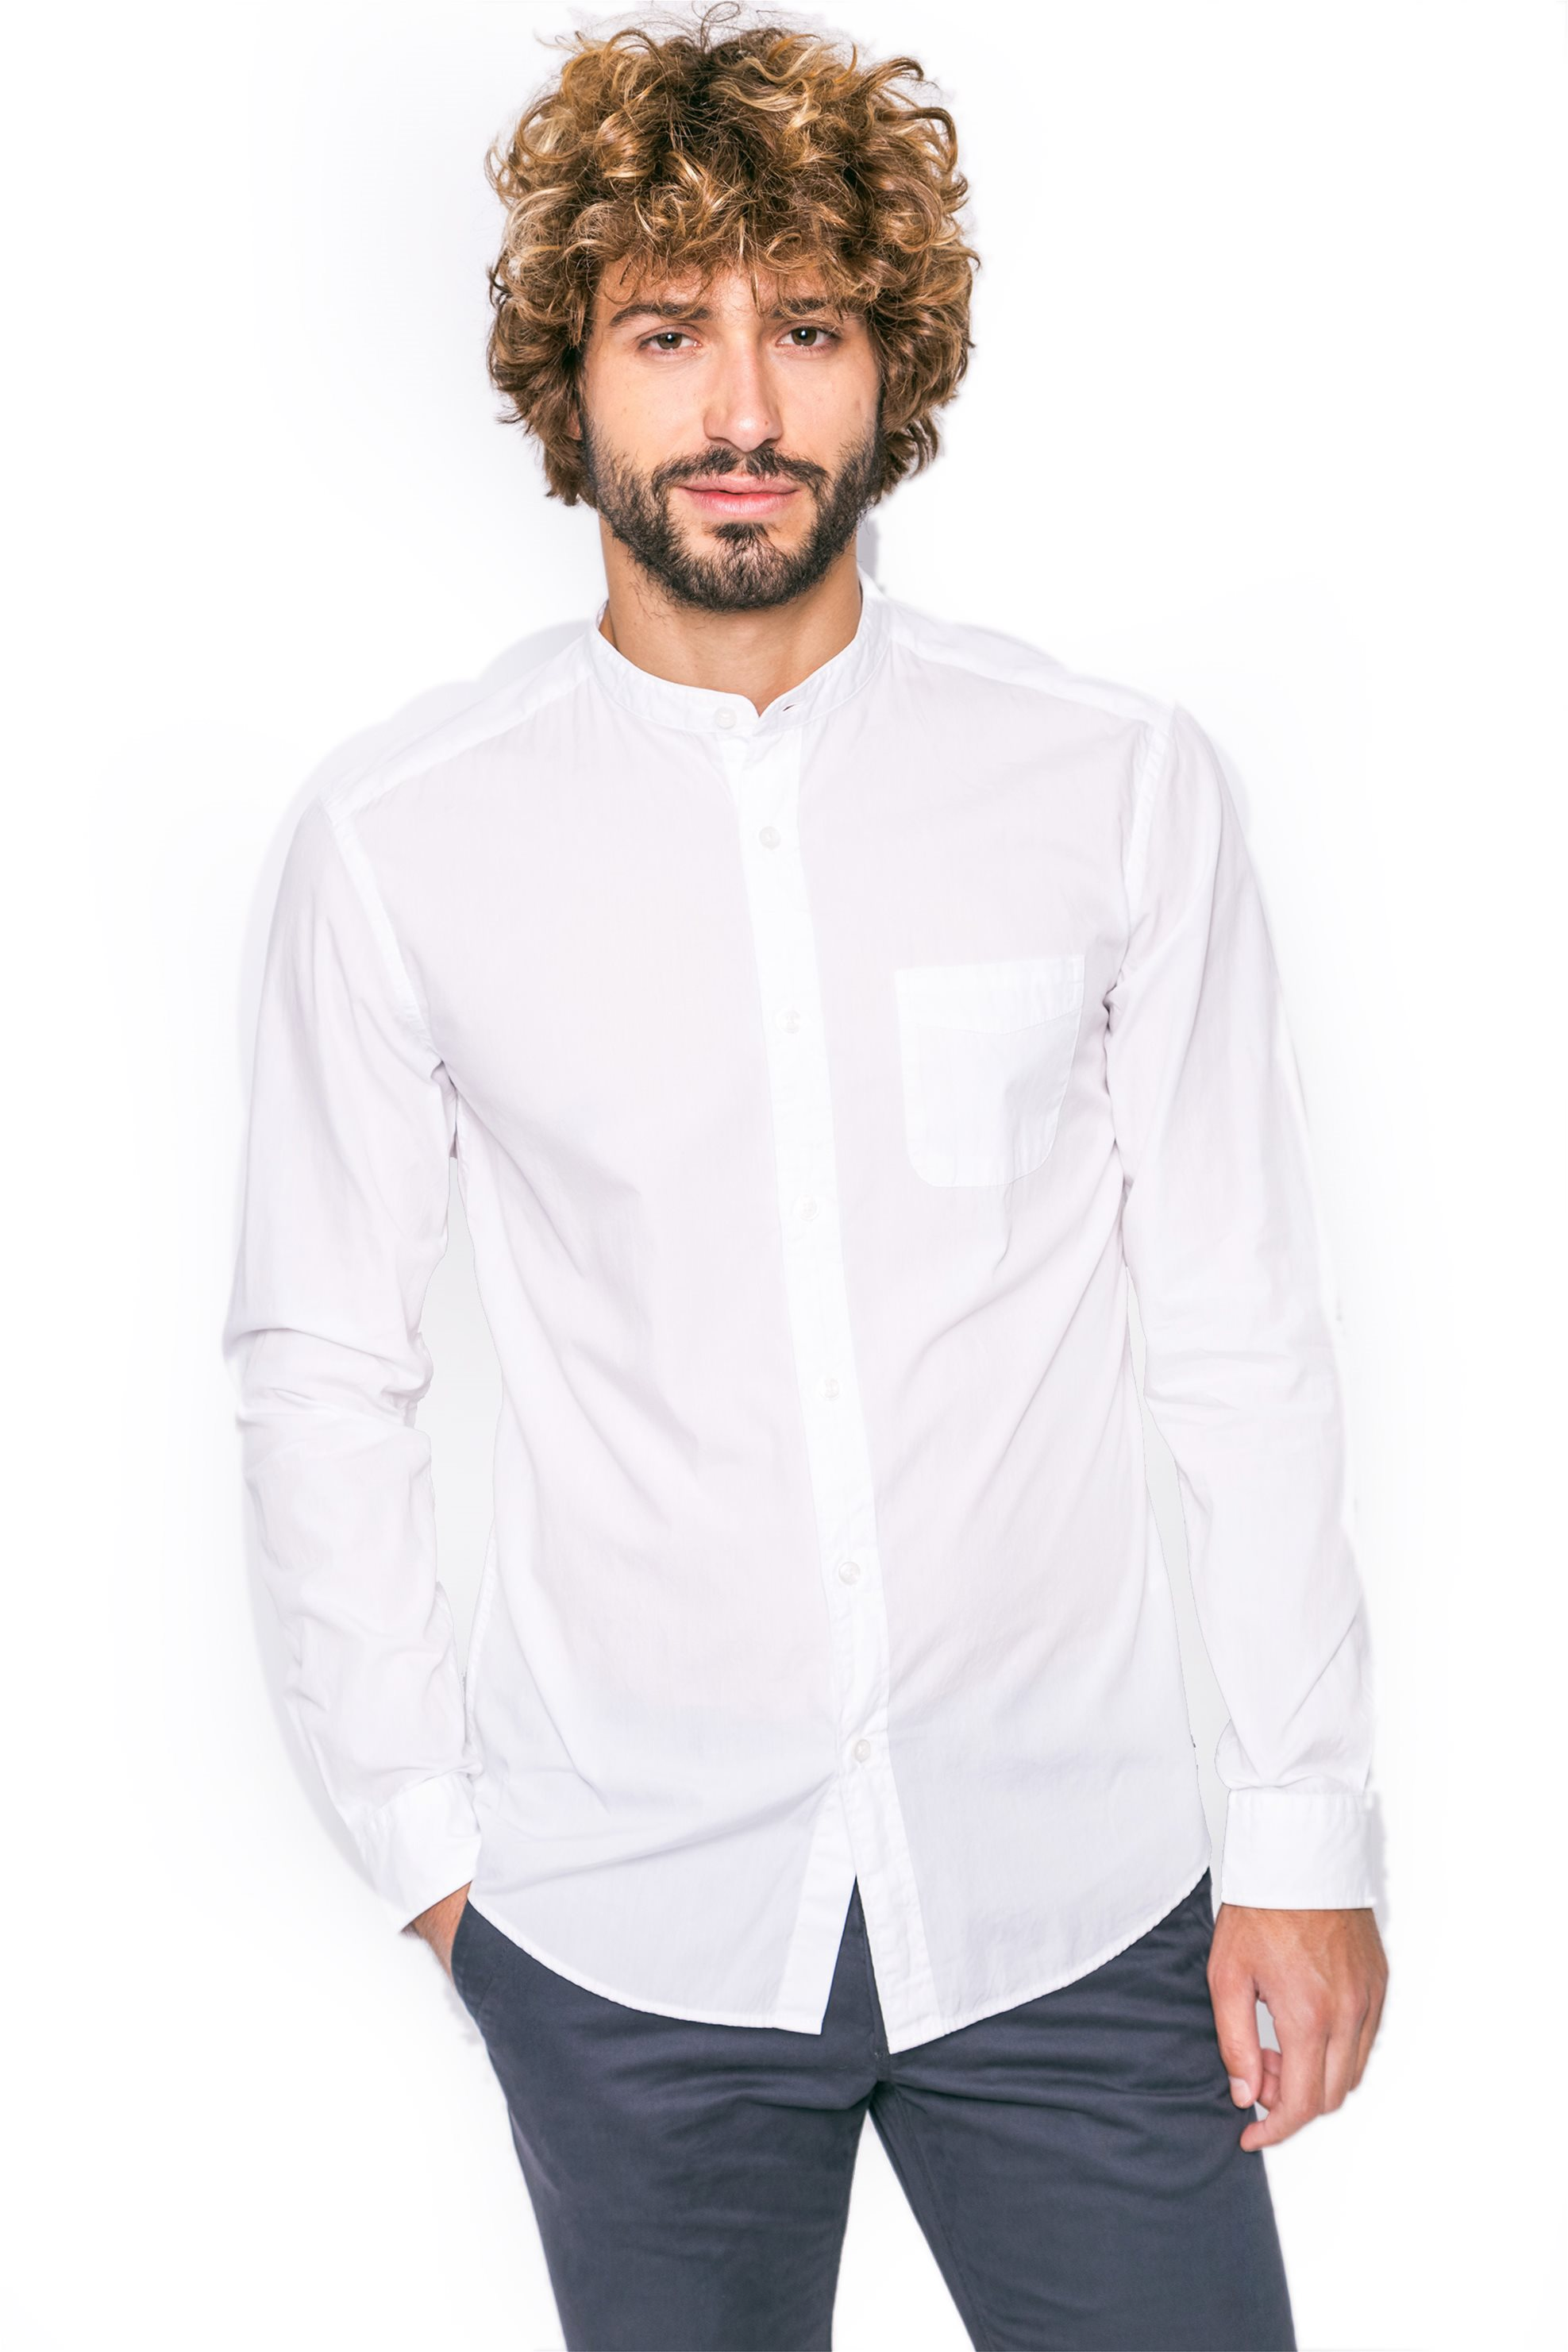 b7b69ca9c450 Notos Ανδρικό πουκάμισο Esprit - 077EE2F015 - Λευκό